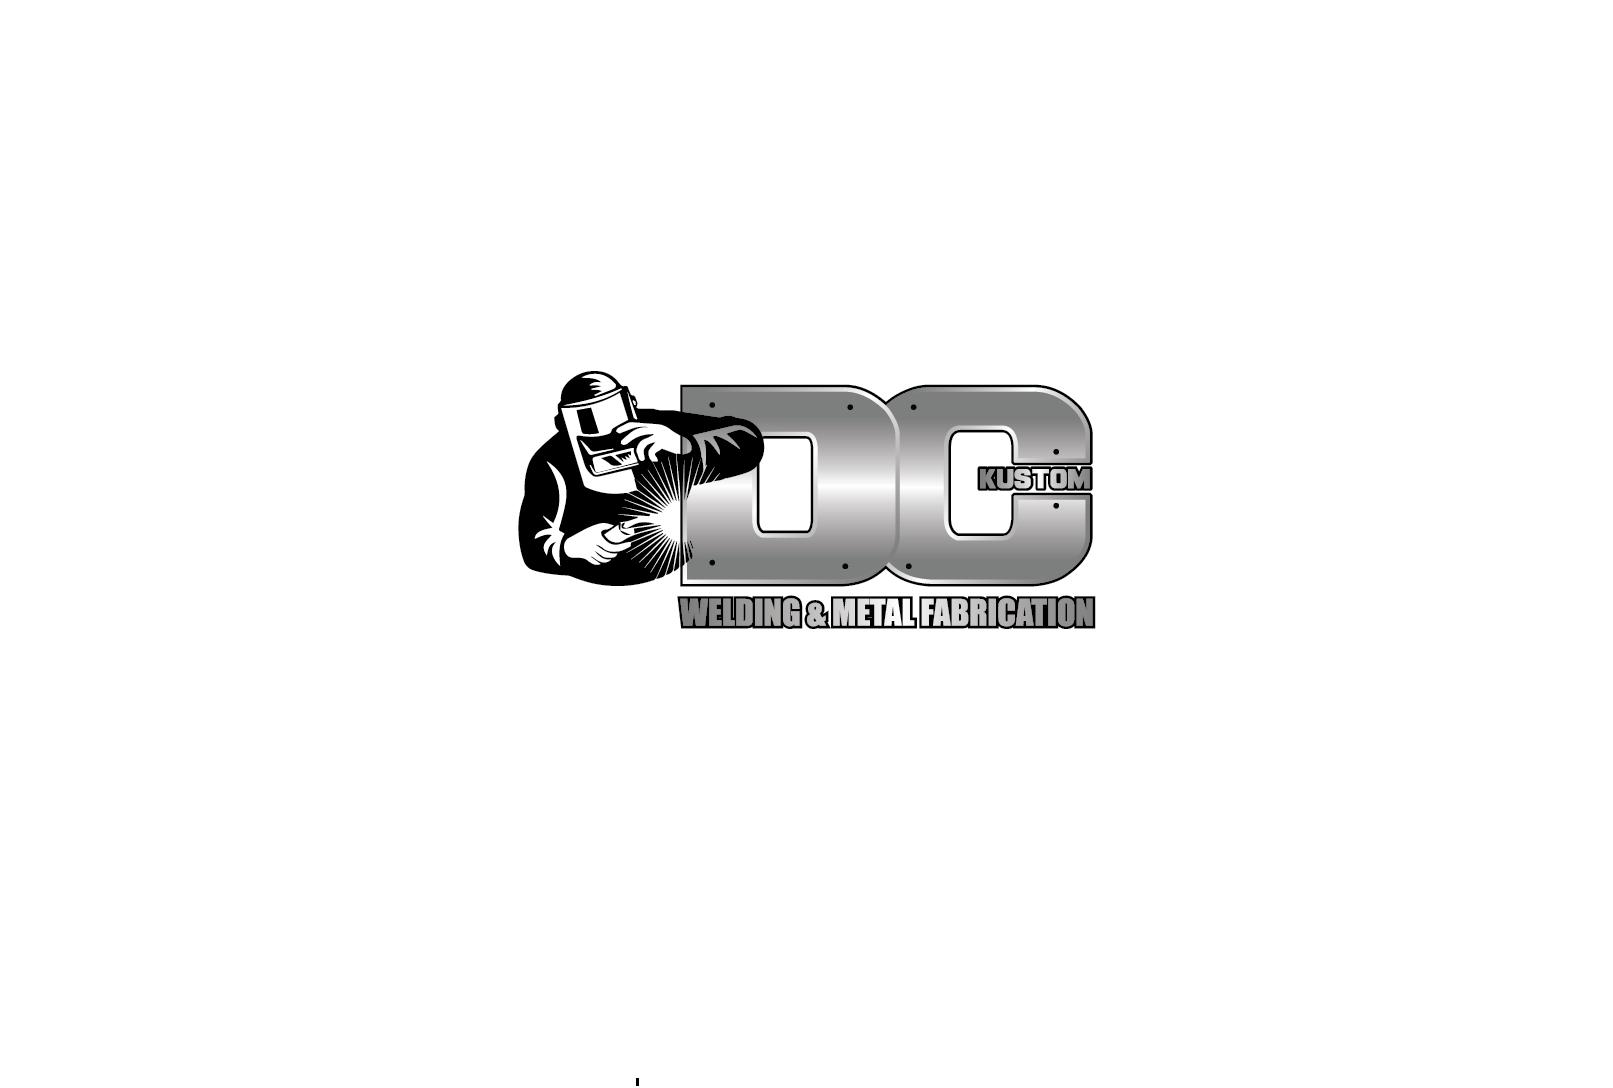 Logo Design by pojas12 - Entry No. 88 in the Logo Design Contest Imaginative Logo Design for DC KUSTOM WELDING & METAL FABRICATION.